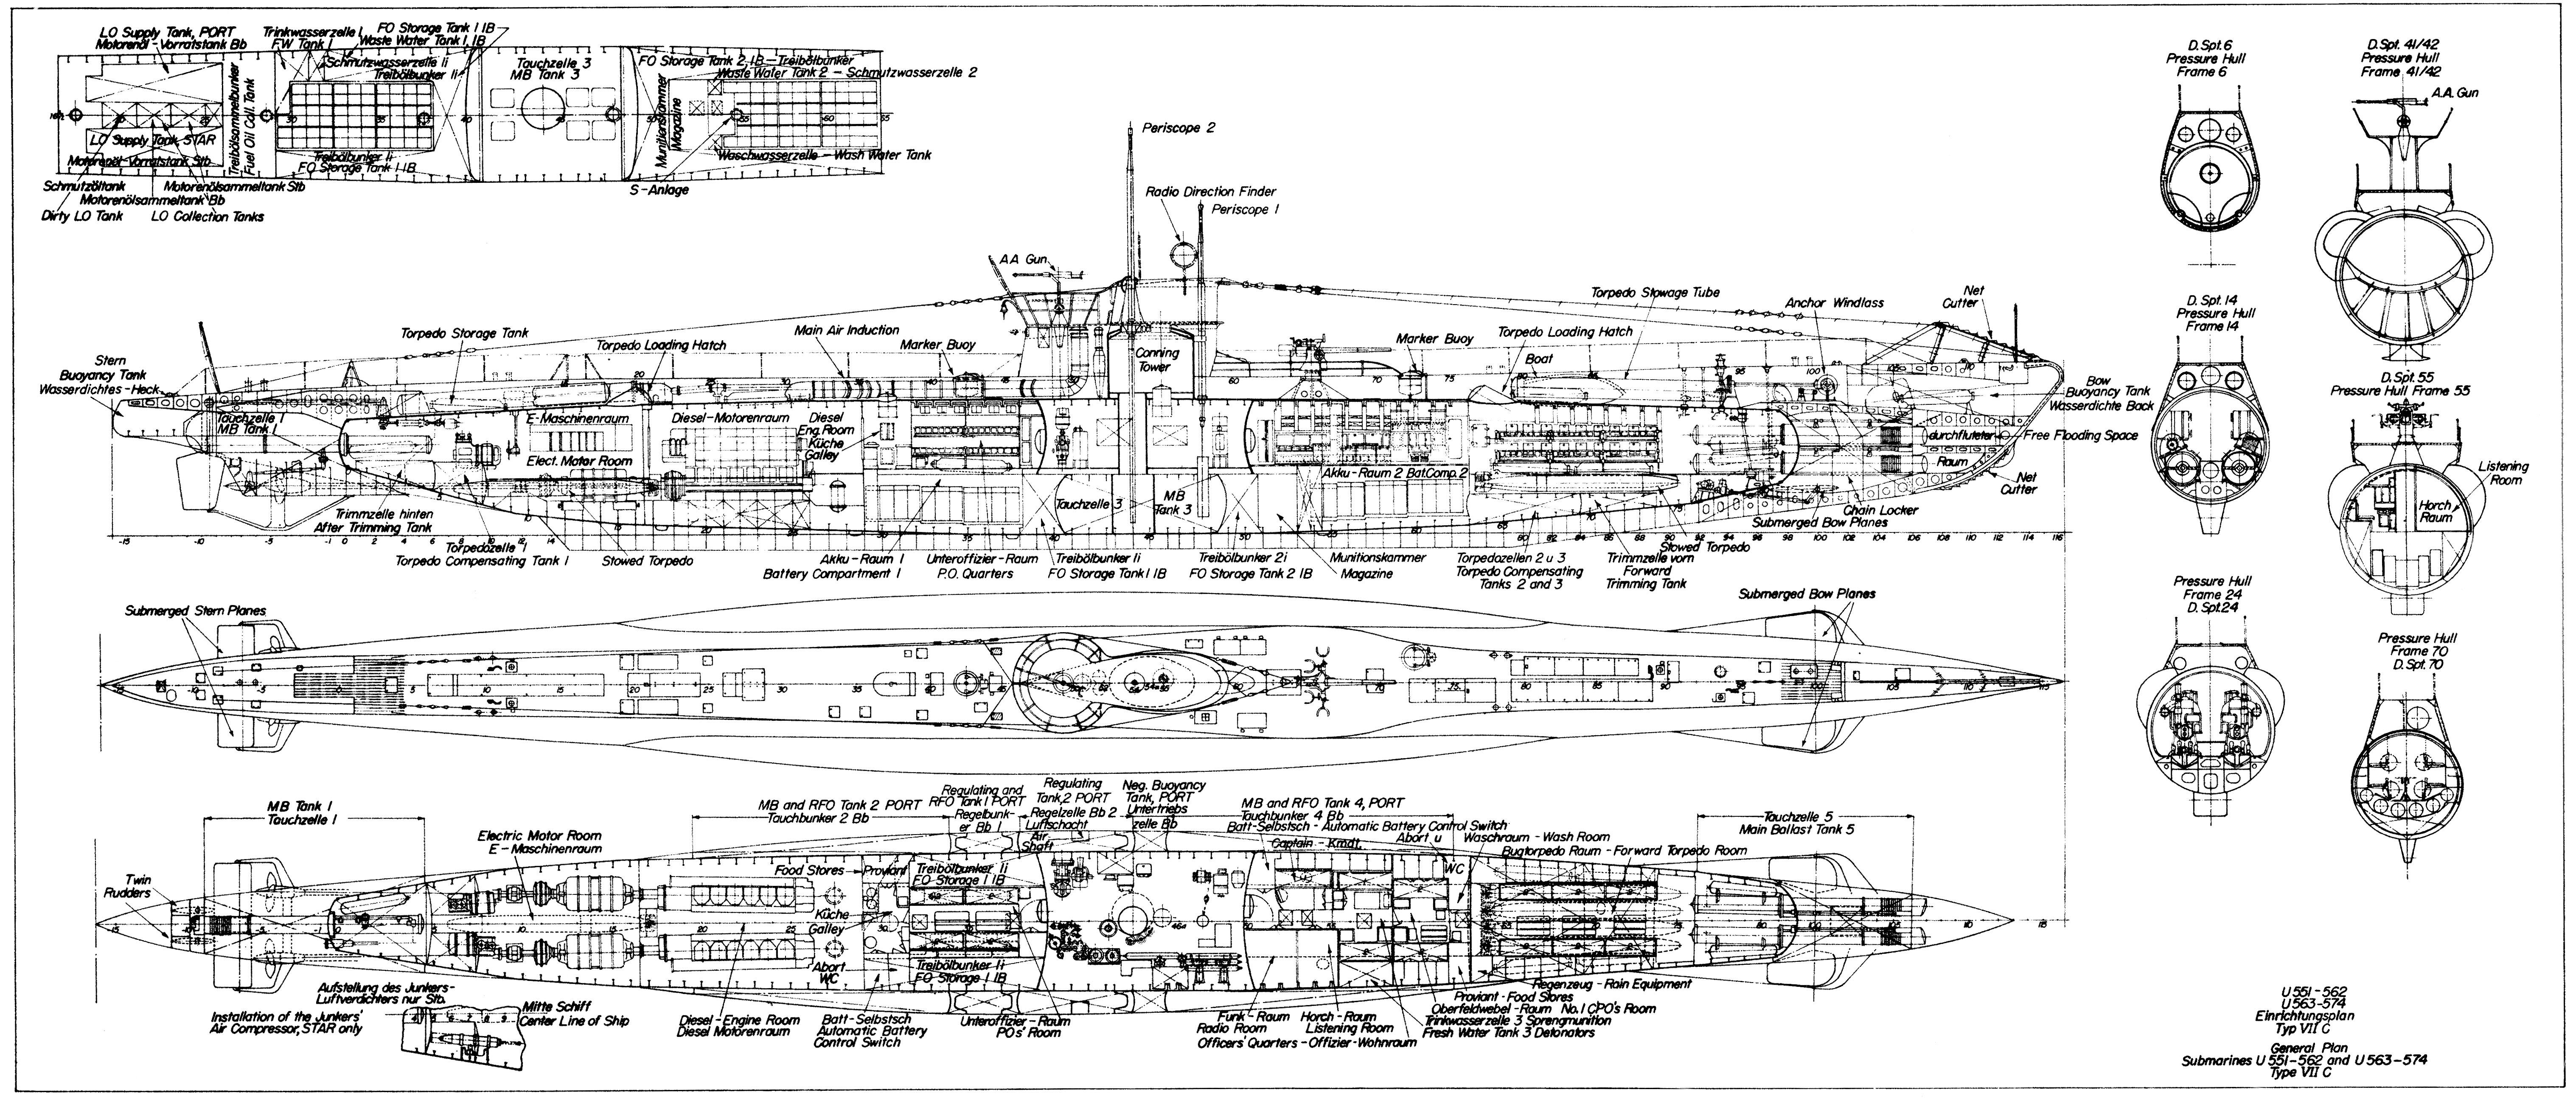 german u boat diagram inside wiring schematic diagram